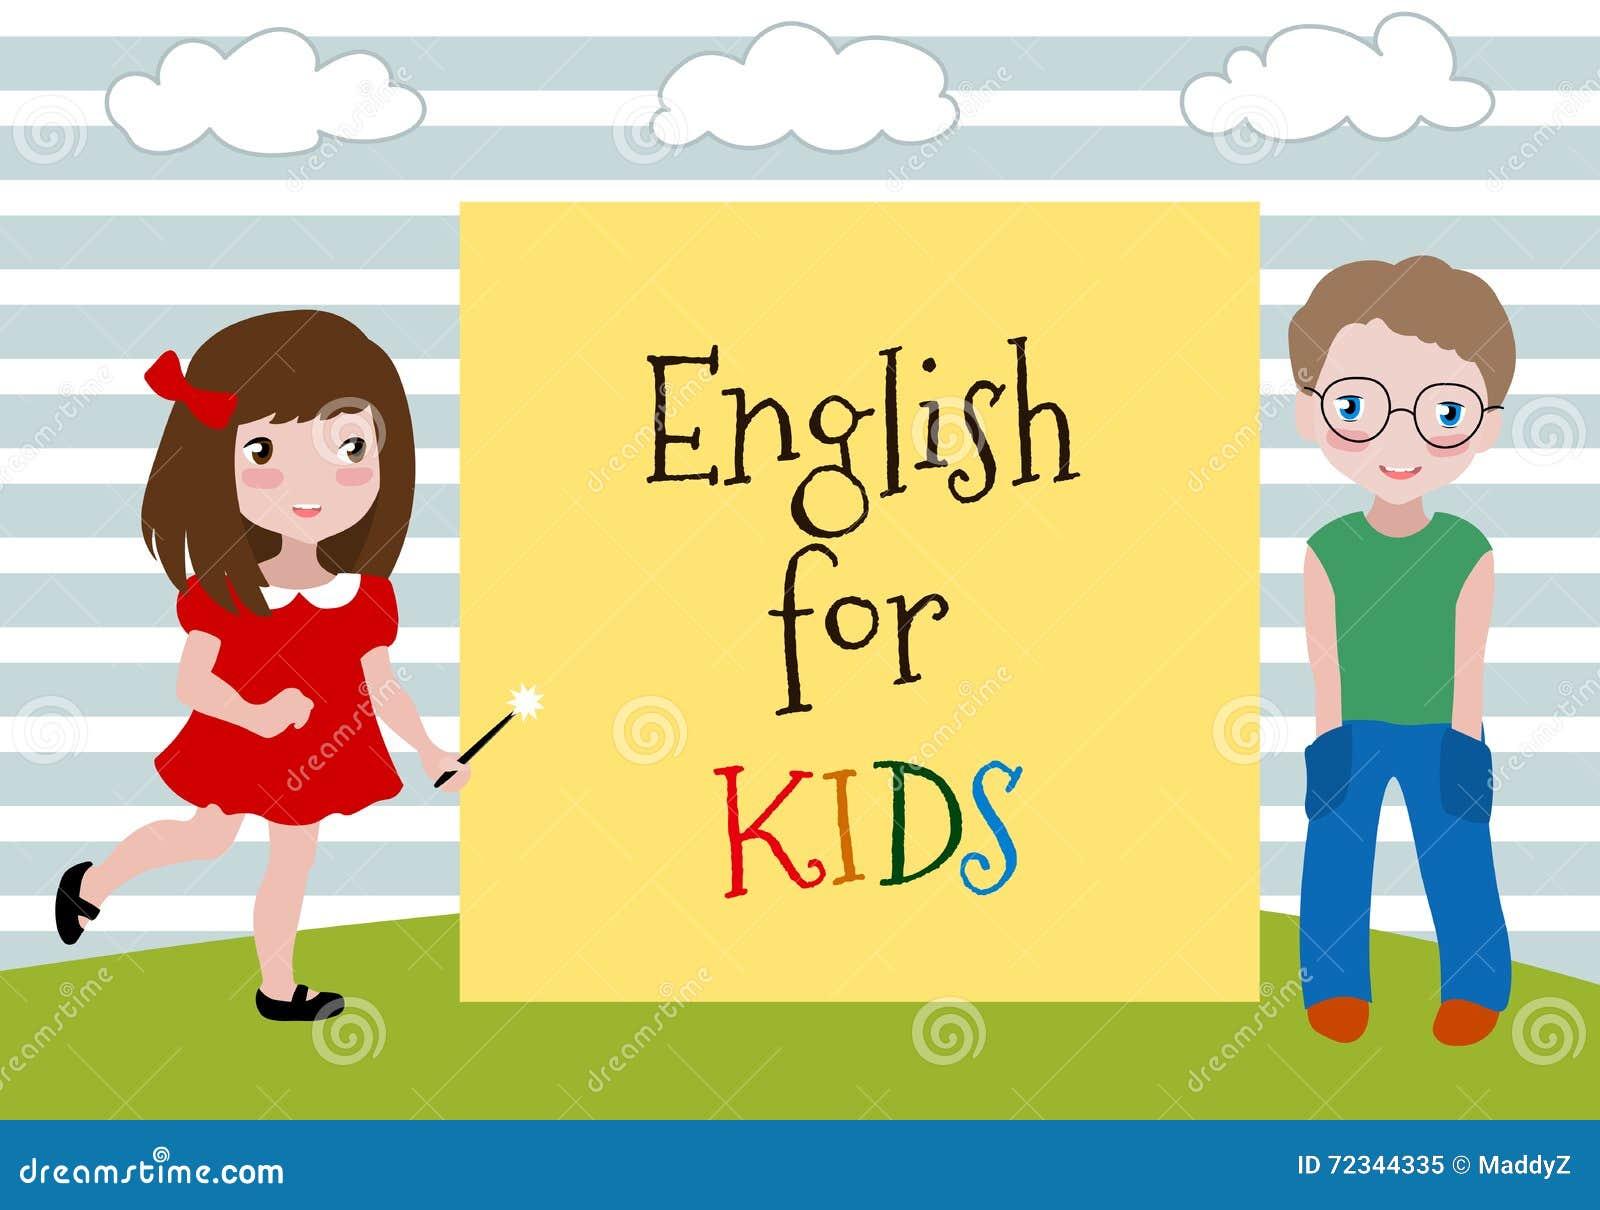 53 Ways to Help Your Child Learn - California Teachers ...